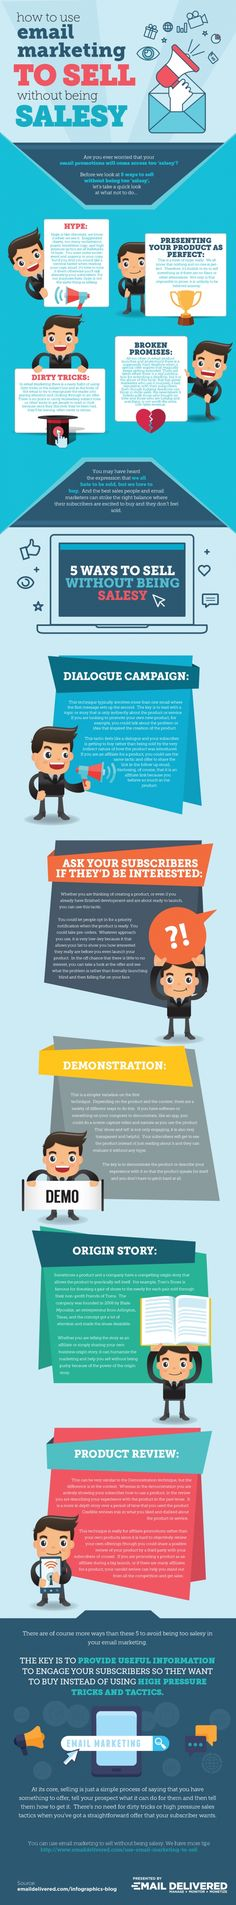 internet marketing methods